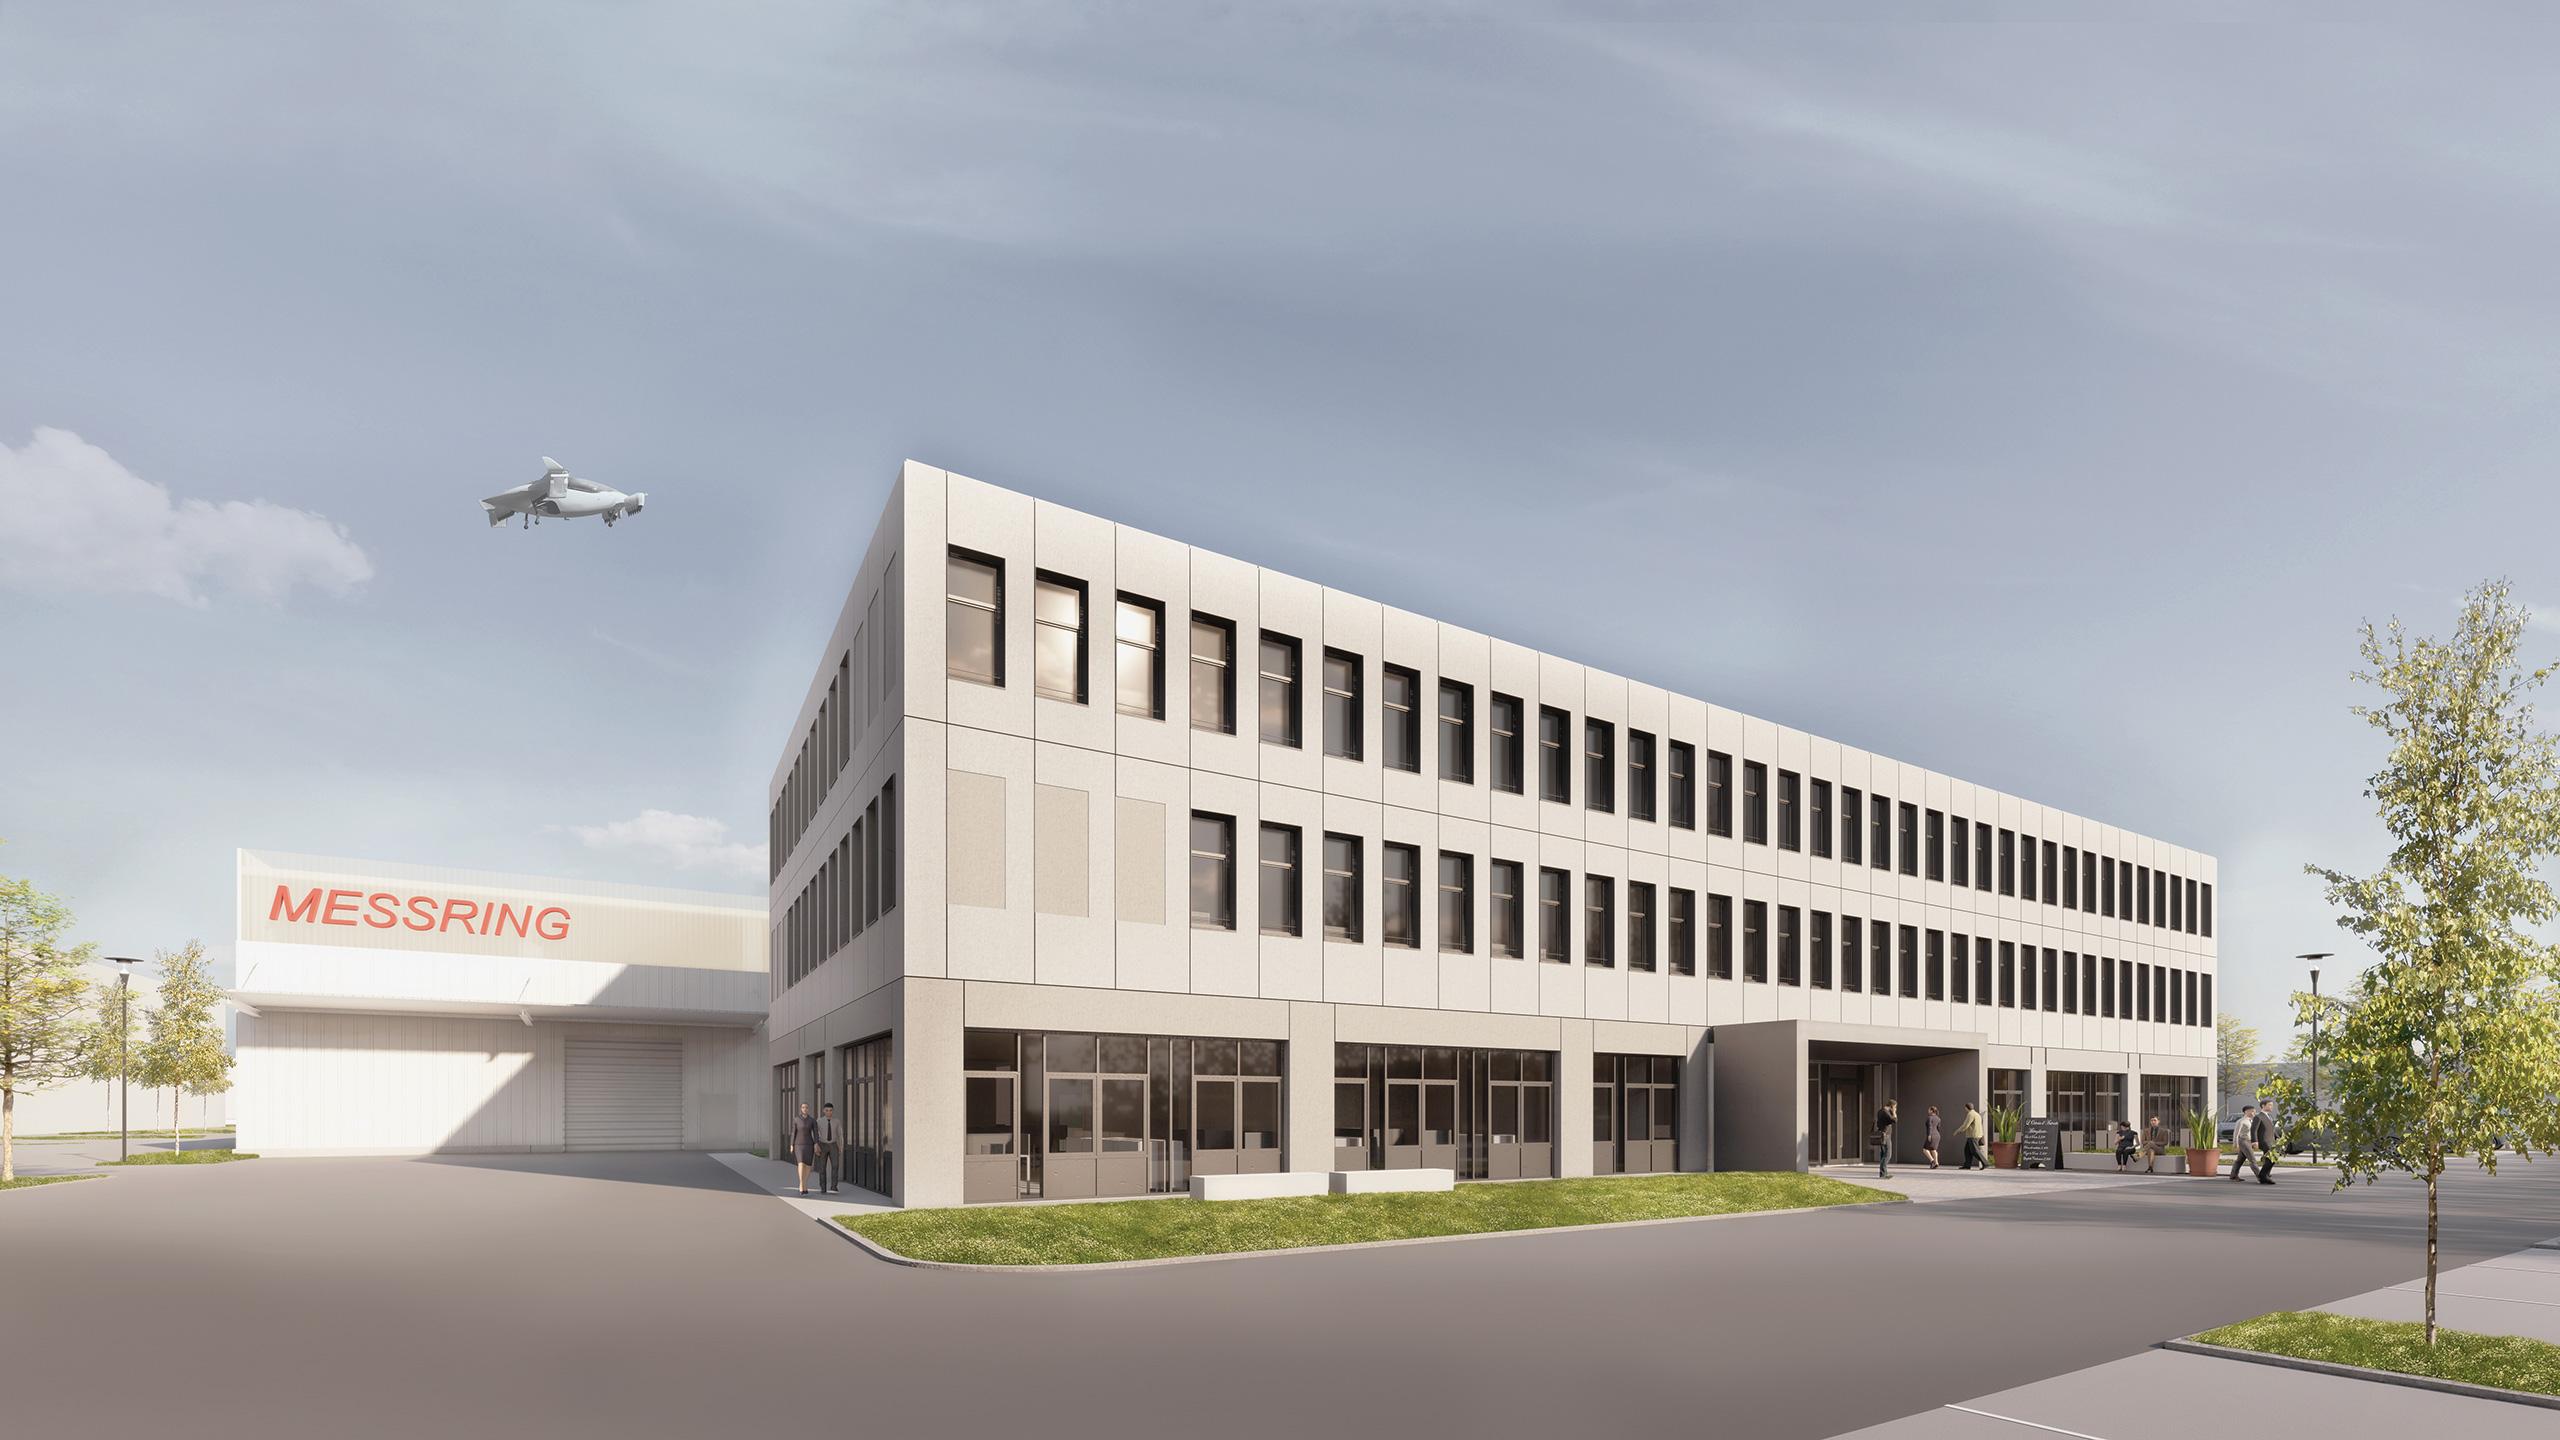 Bottler_Lutz_Architektur_Industrie_Büro_Messring